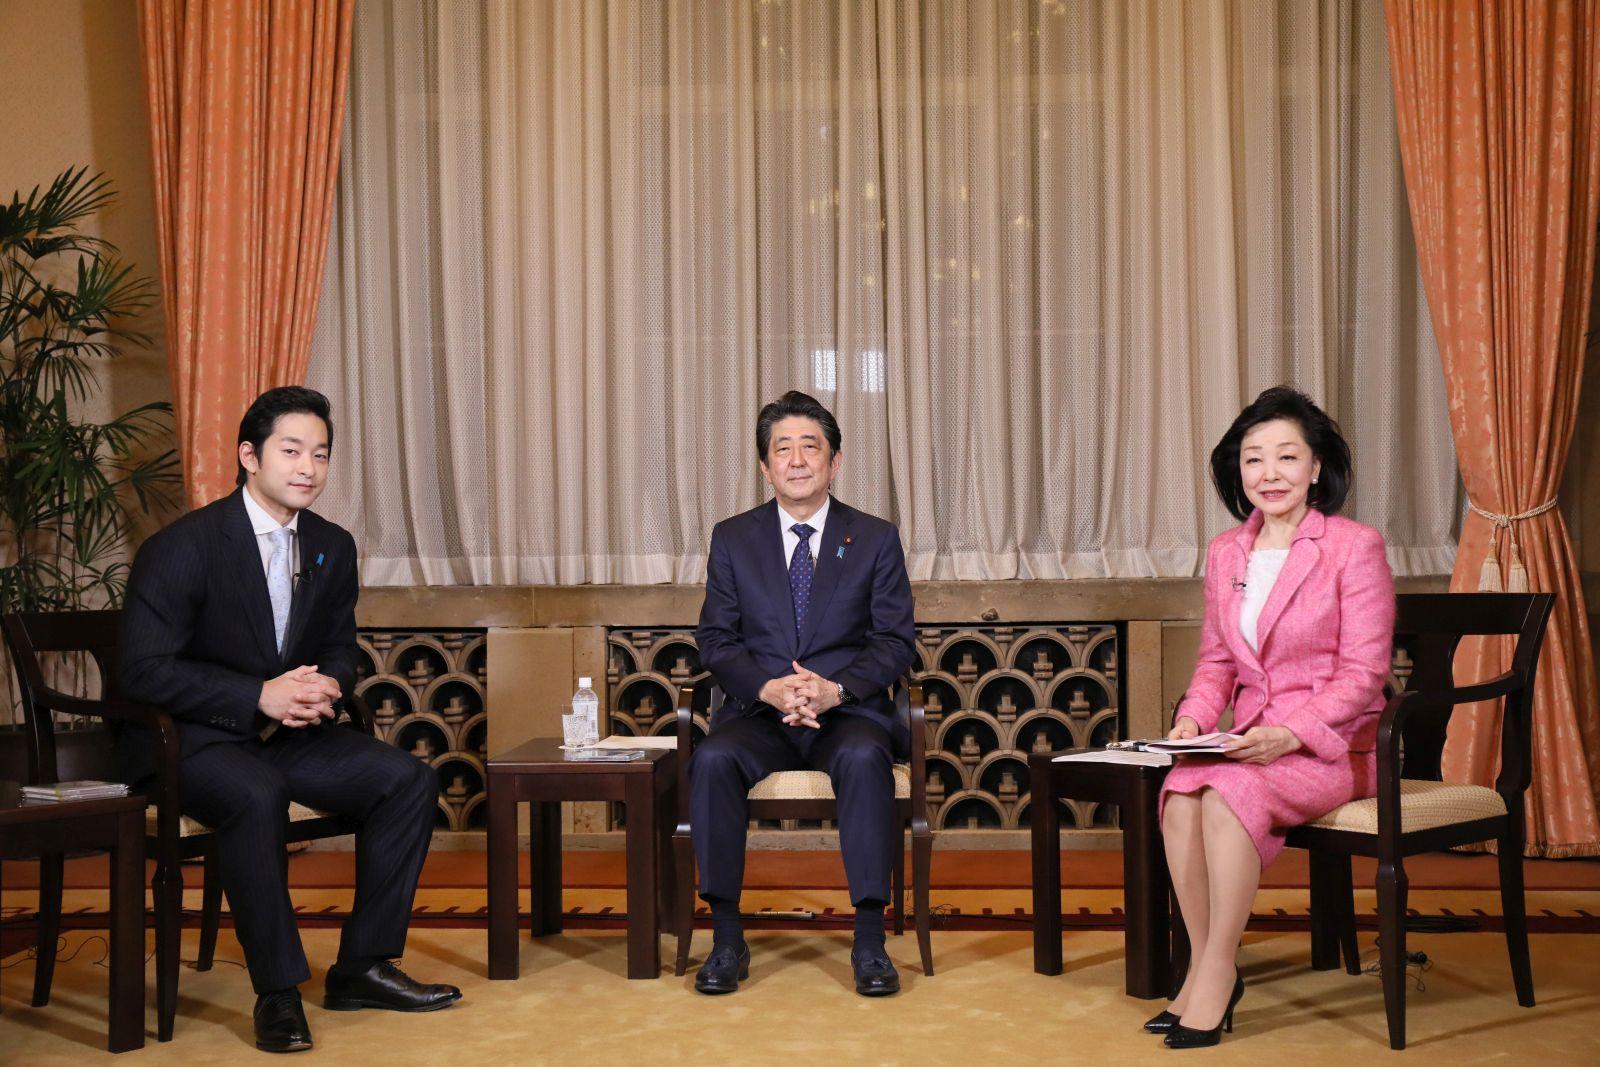 DIALOGUE   Prime Minister Shinzo Abe, Violinist Ryu Goto with Yoshiko Sakurai